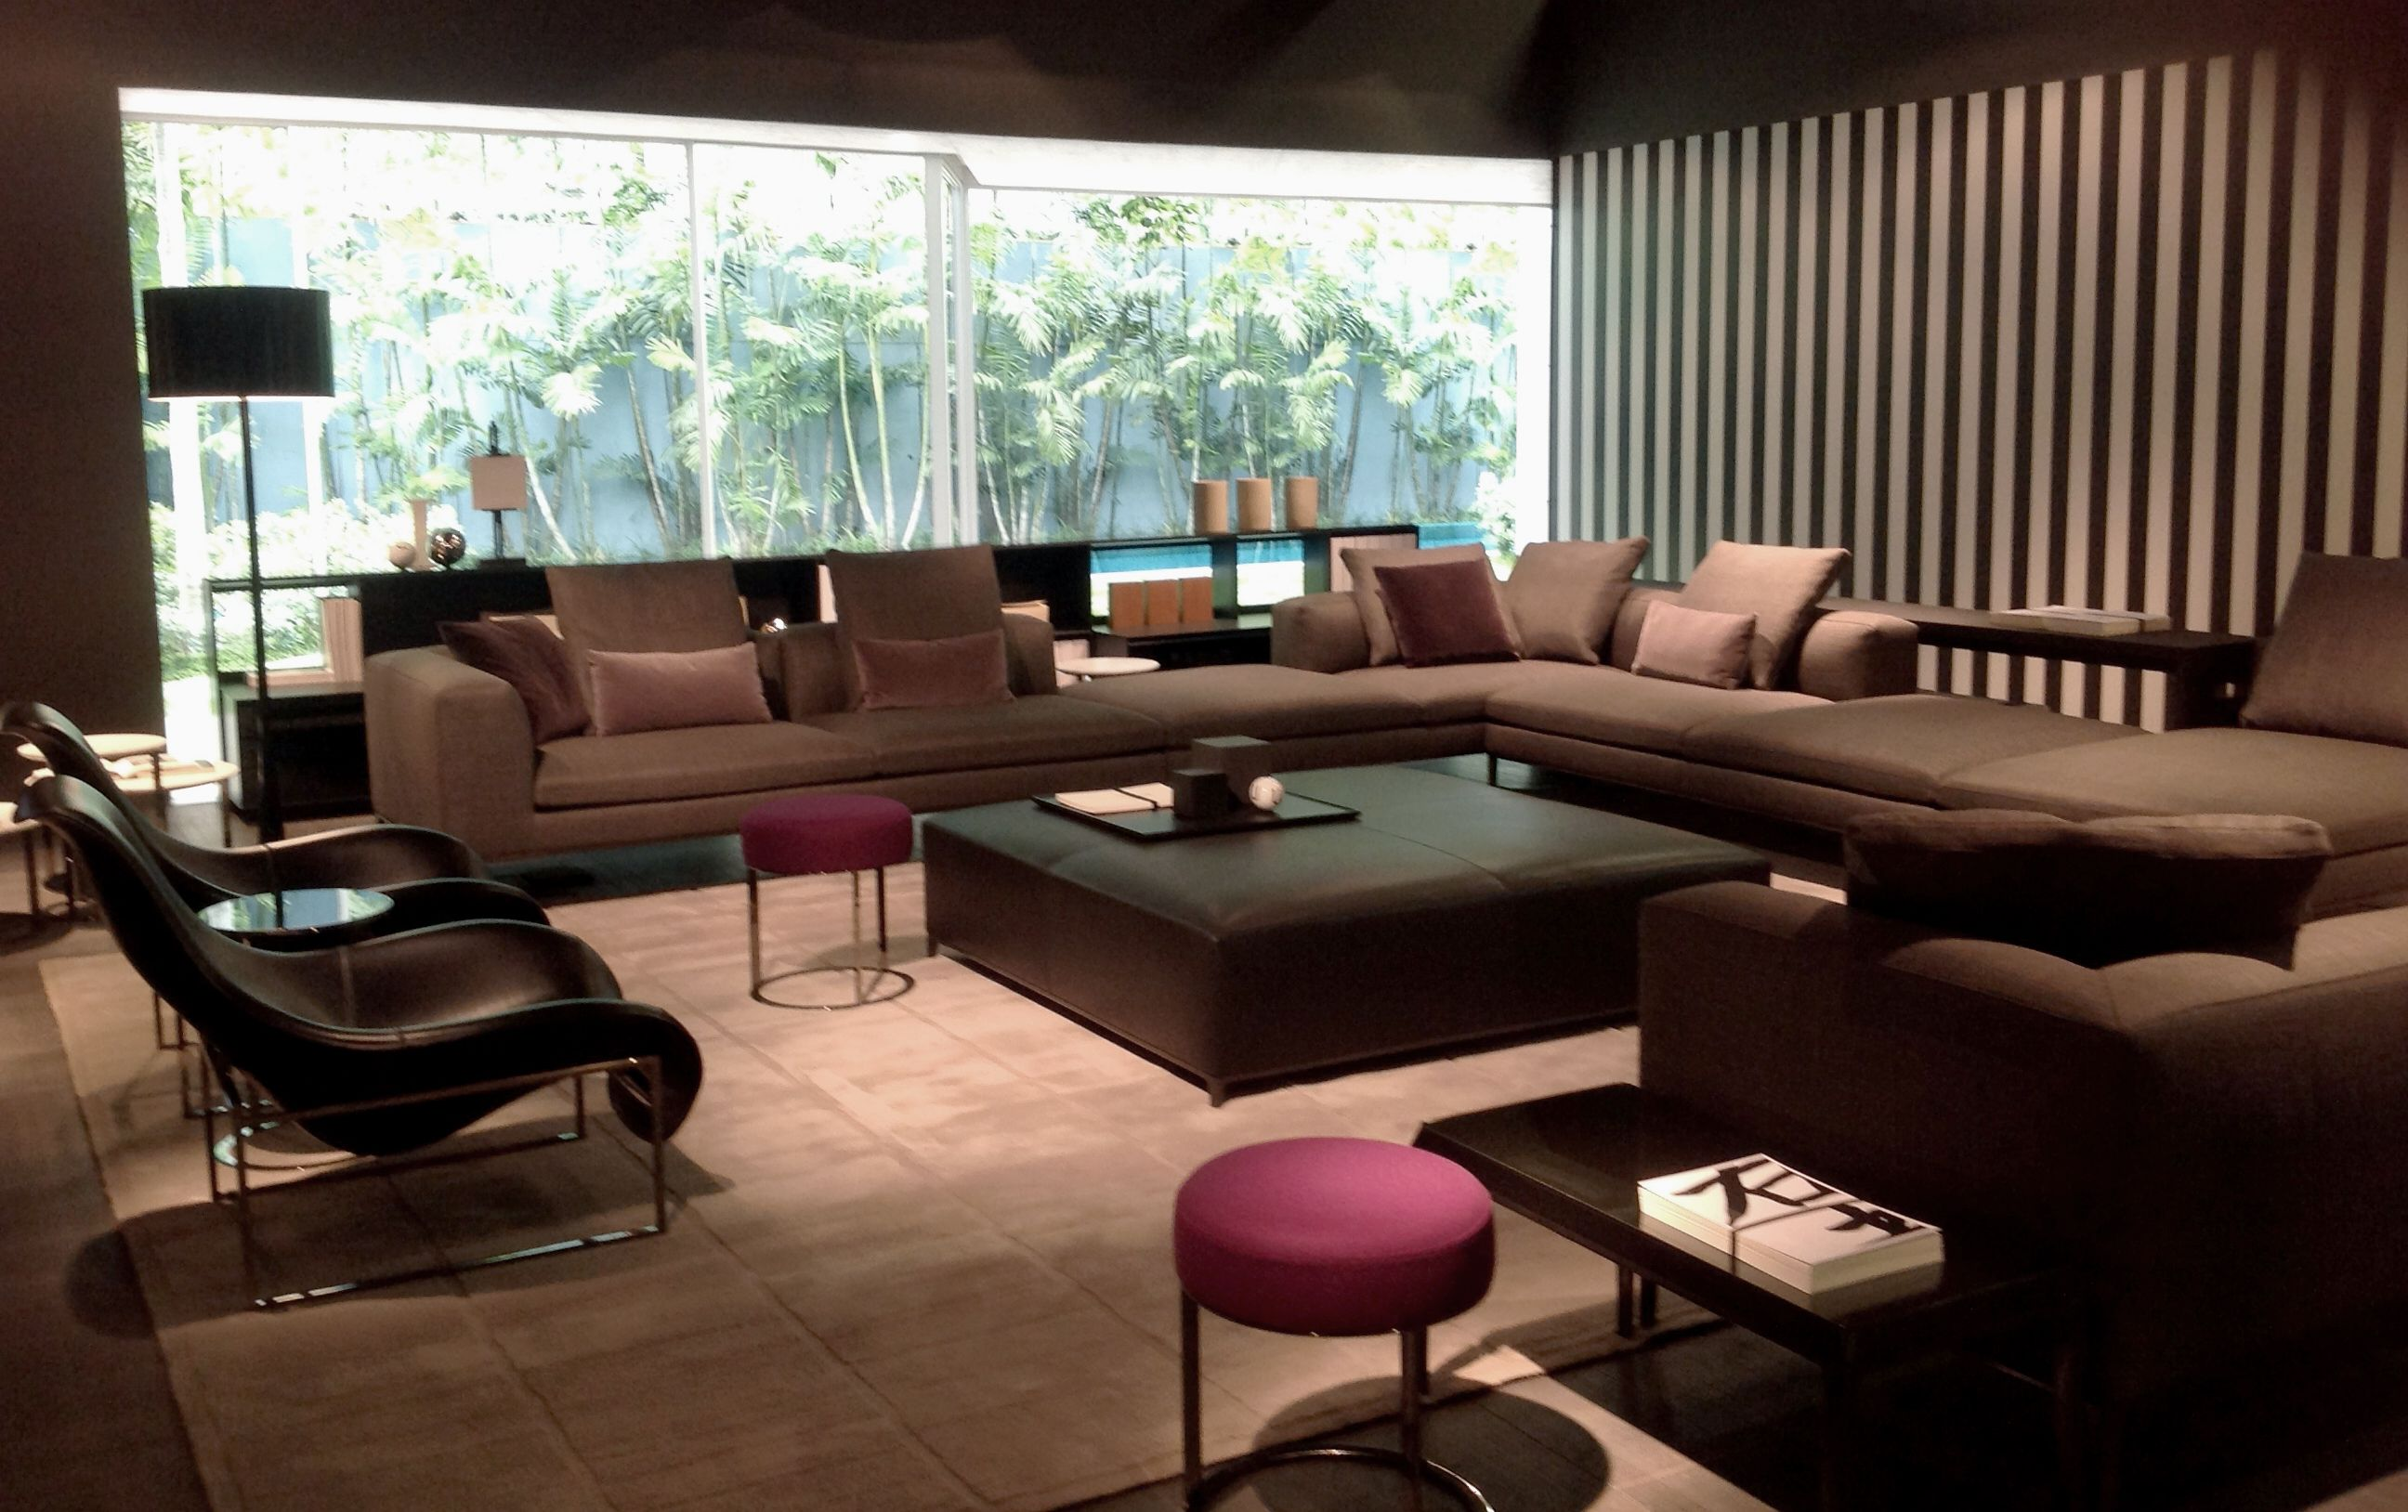 b b italia koln 2015 bebitalia koln immcologne newdesigns imm cologne 2015 pinterest. Black Bedroom Furniture Sets. Home Design Ideas